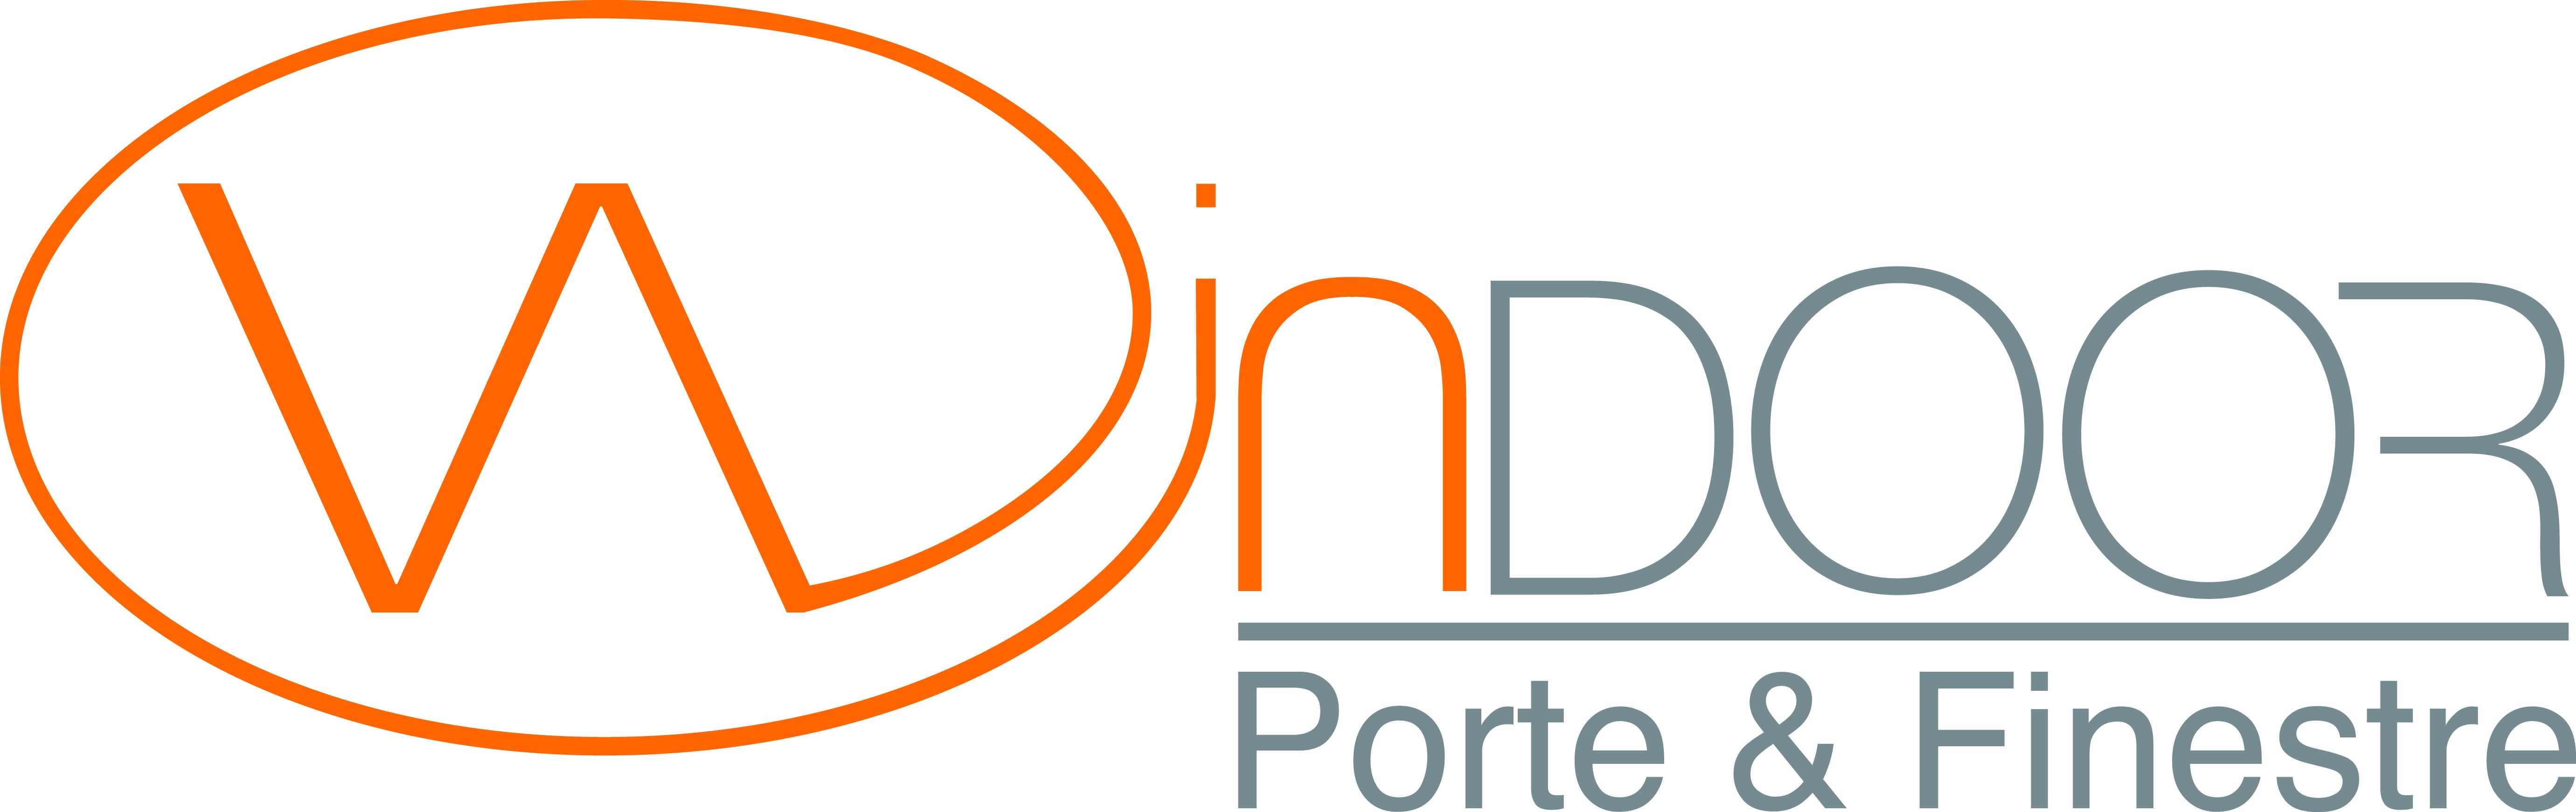 Windoor Porte & Finestre Sagl